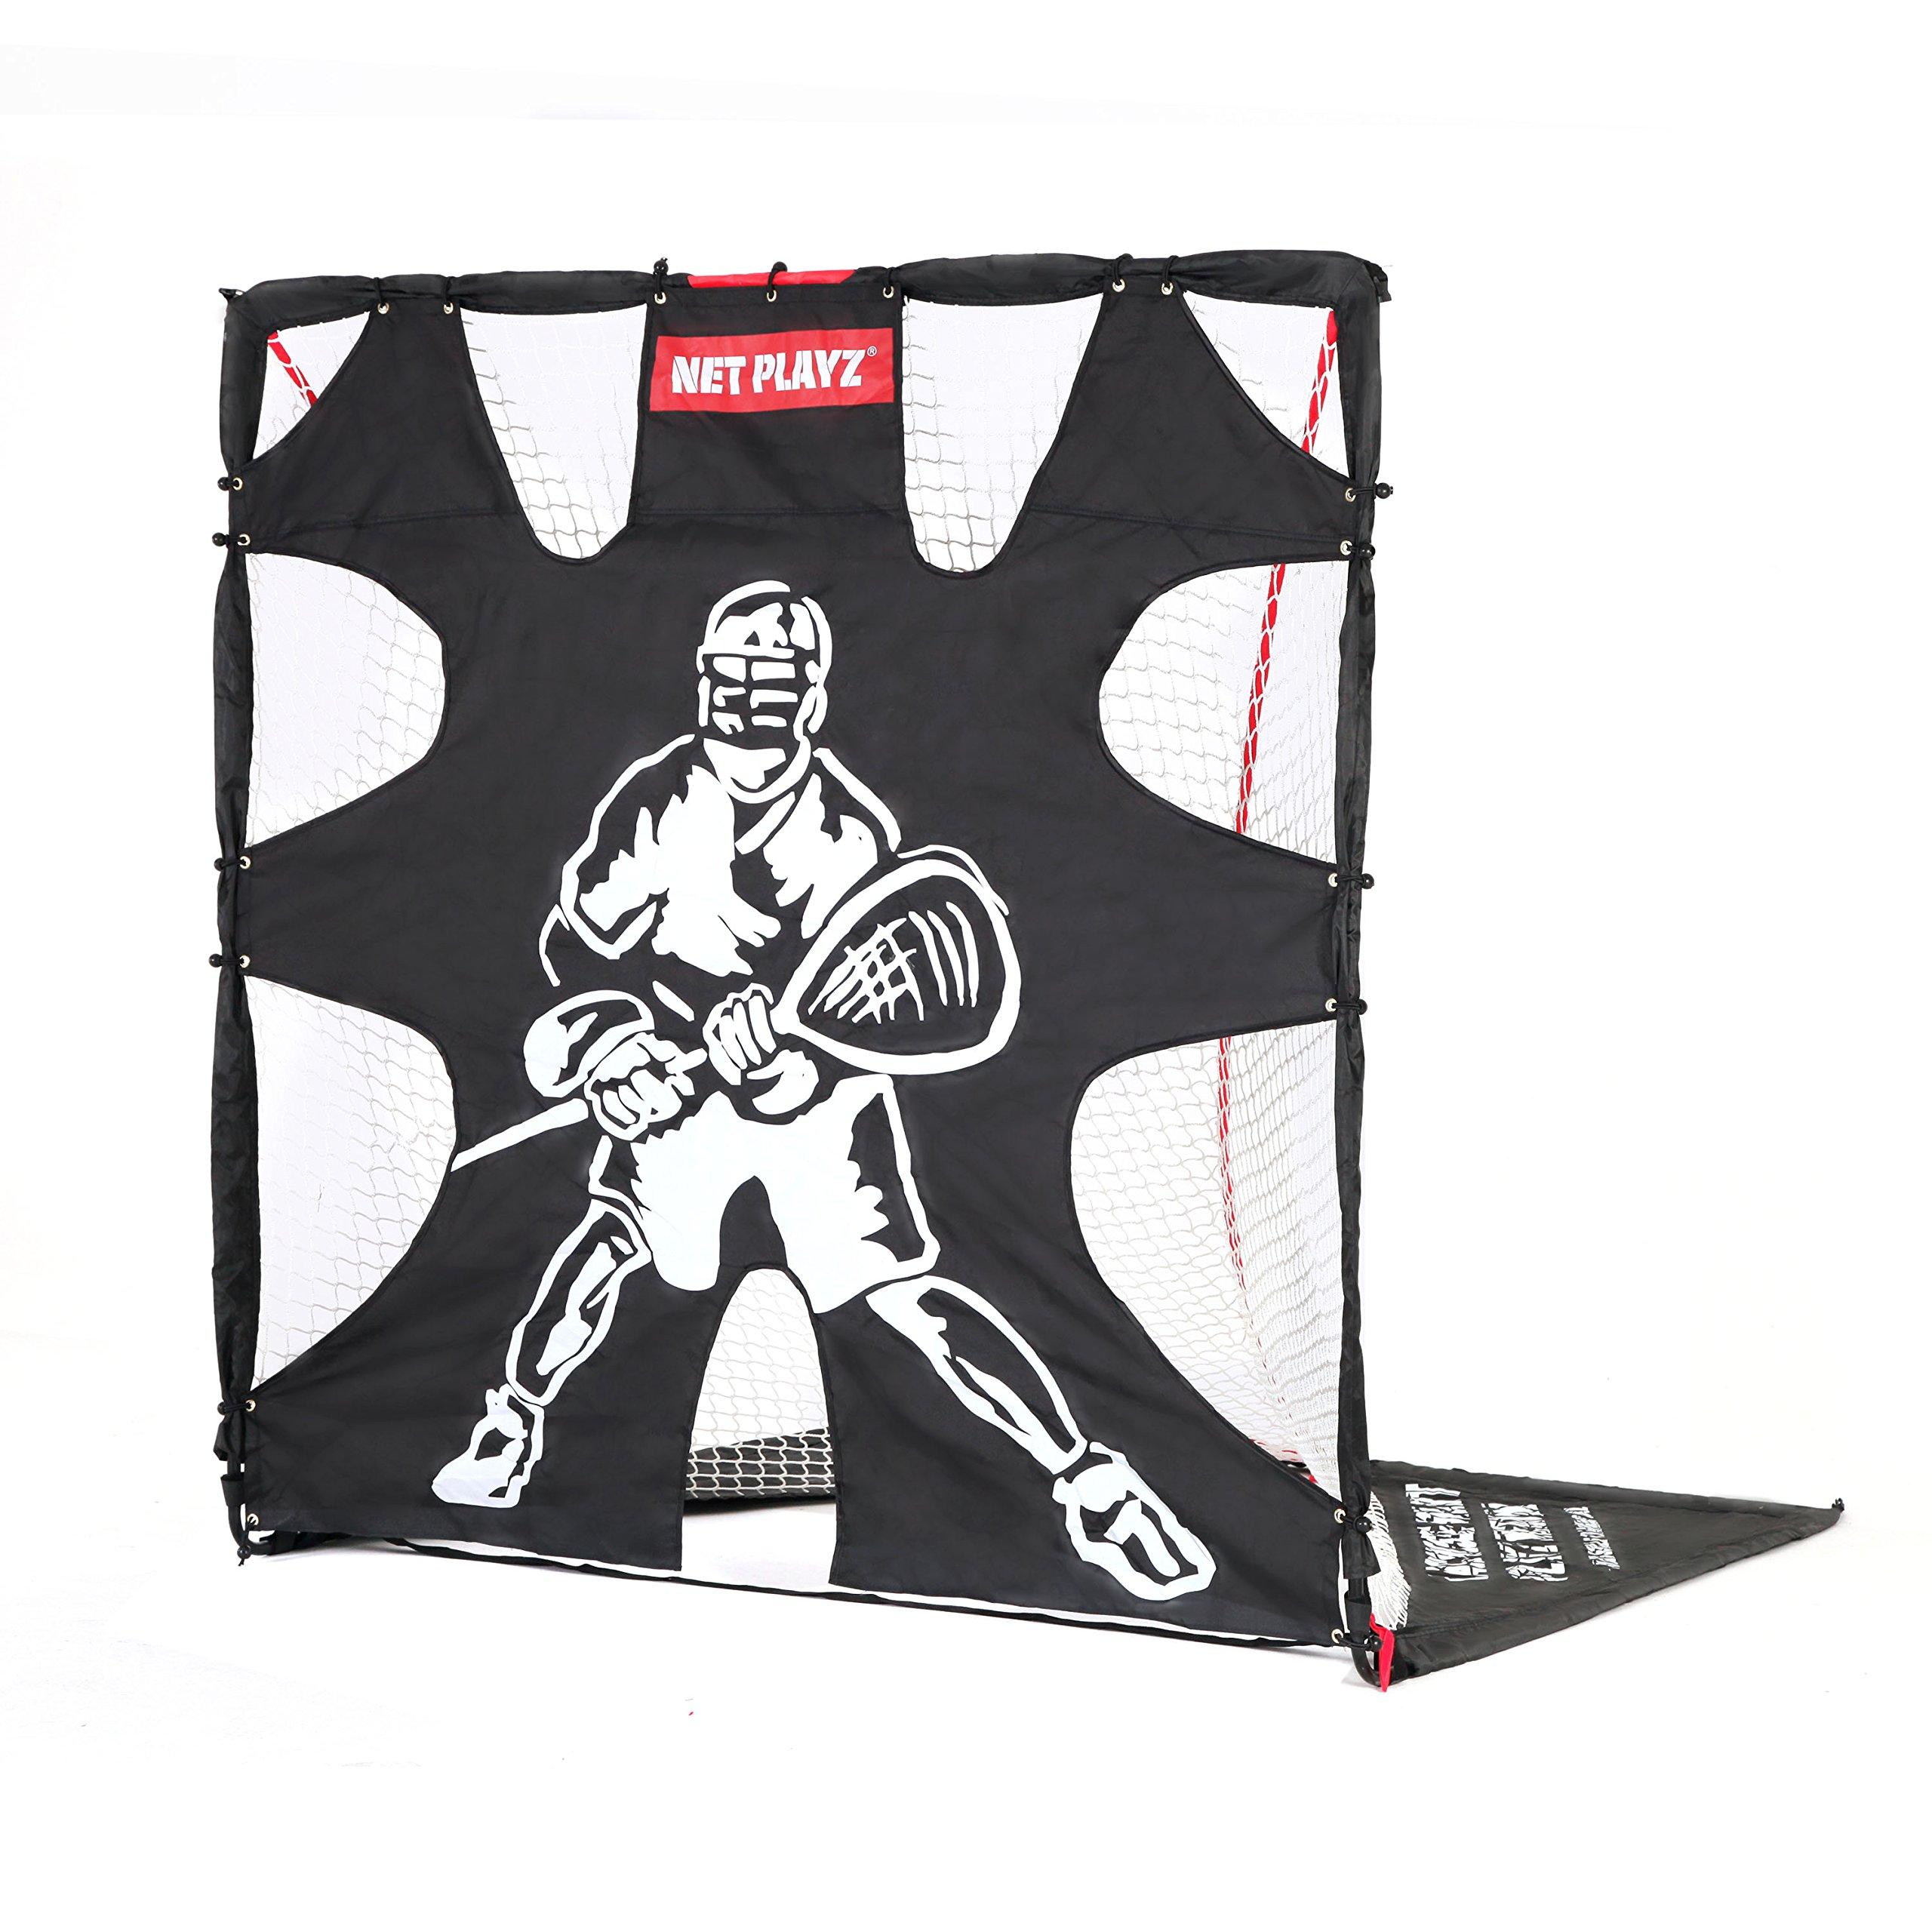 Tri Great USA CORP Net Playz Easy Setup Fiberglass Lacrosse Goal, 6' x 6'